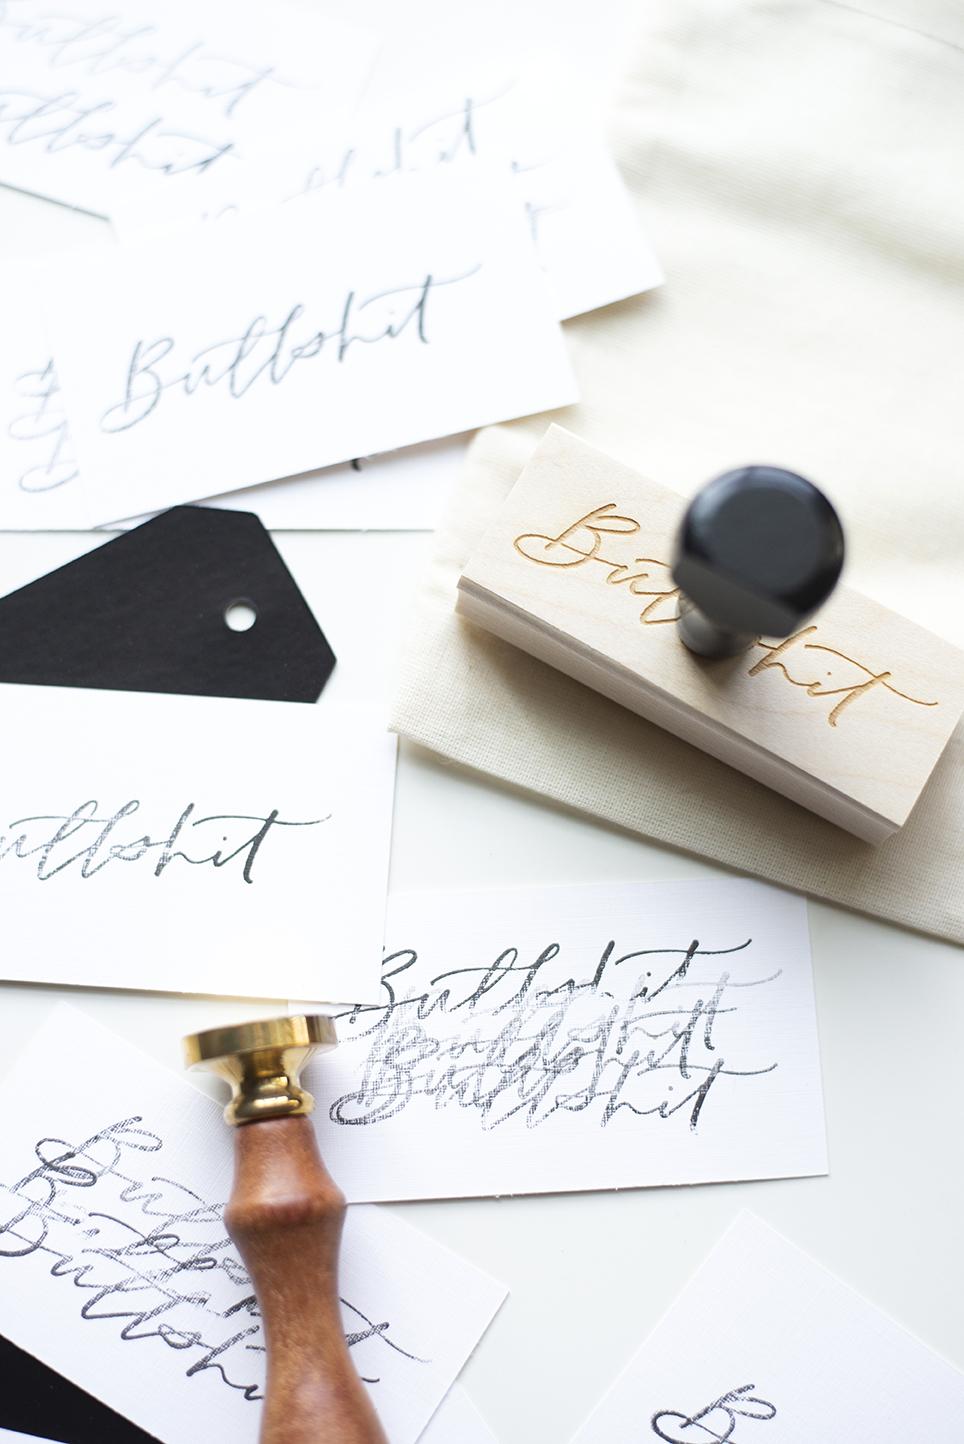 heylux_custom_calligraphy_rubberstamp_web.jpg